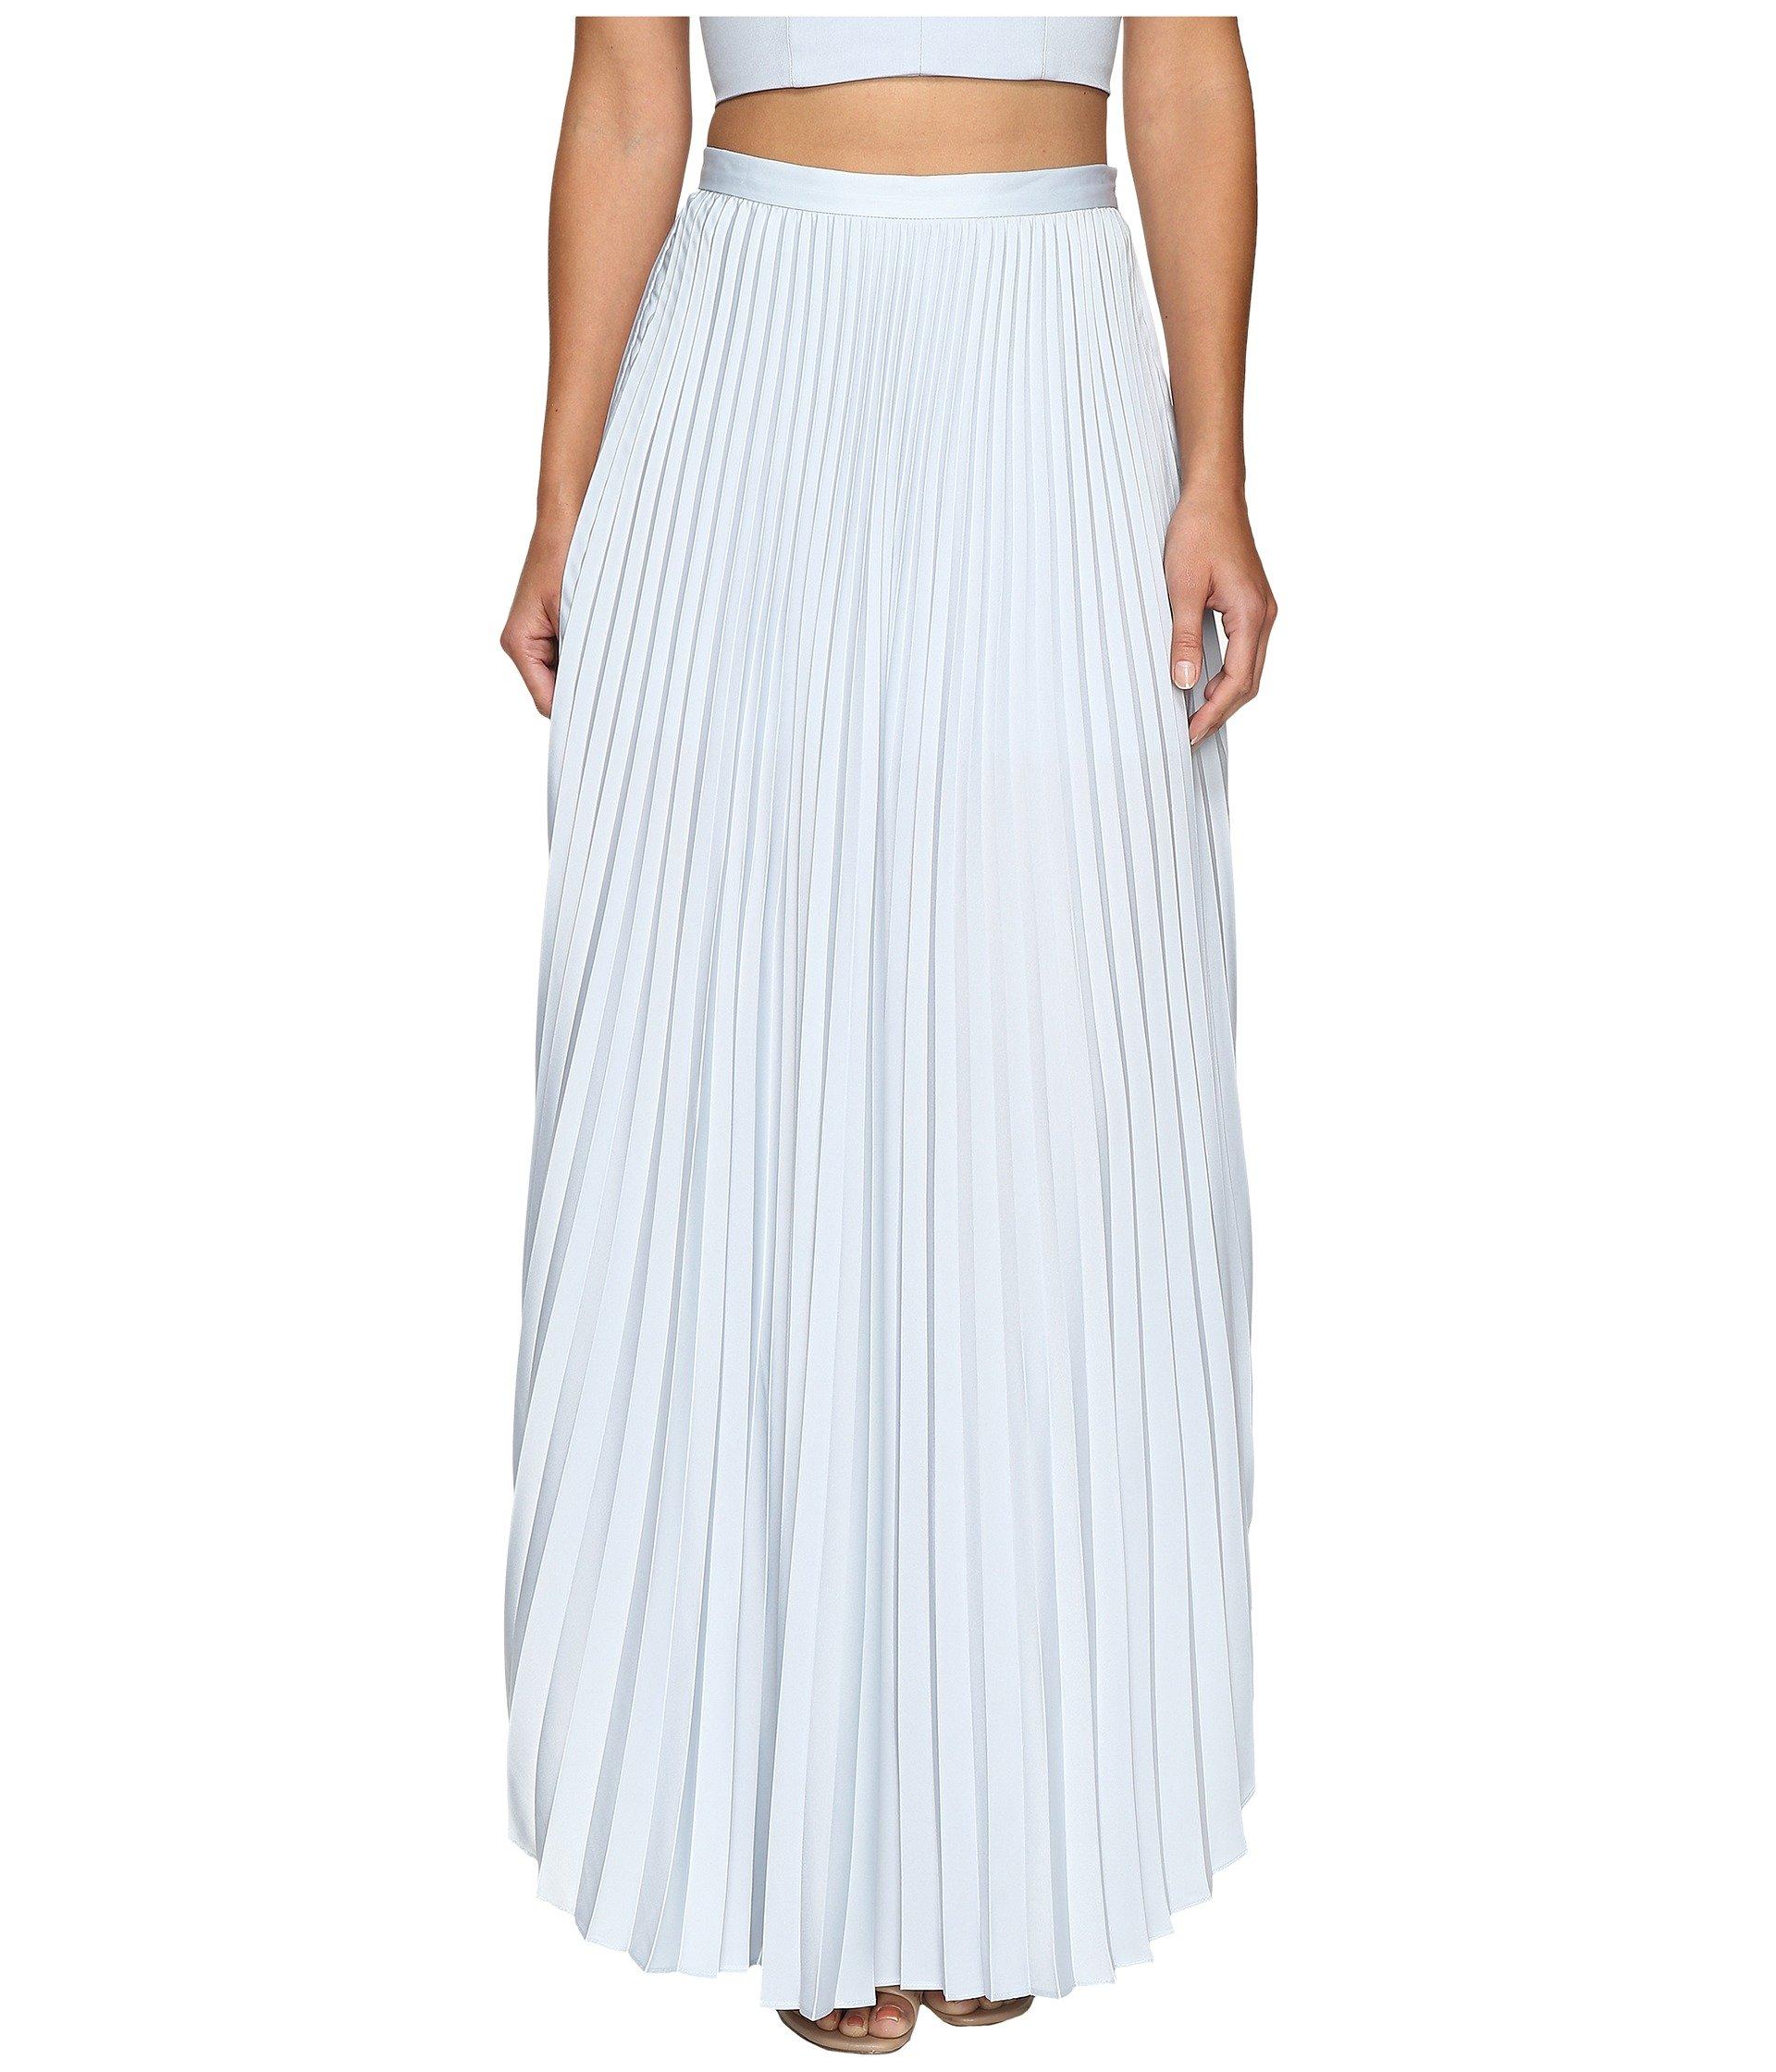 Falda para Mujer Dolce Vita Camryn Skirt  + Dolce Vita en VeoyCompro.net